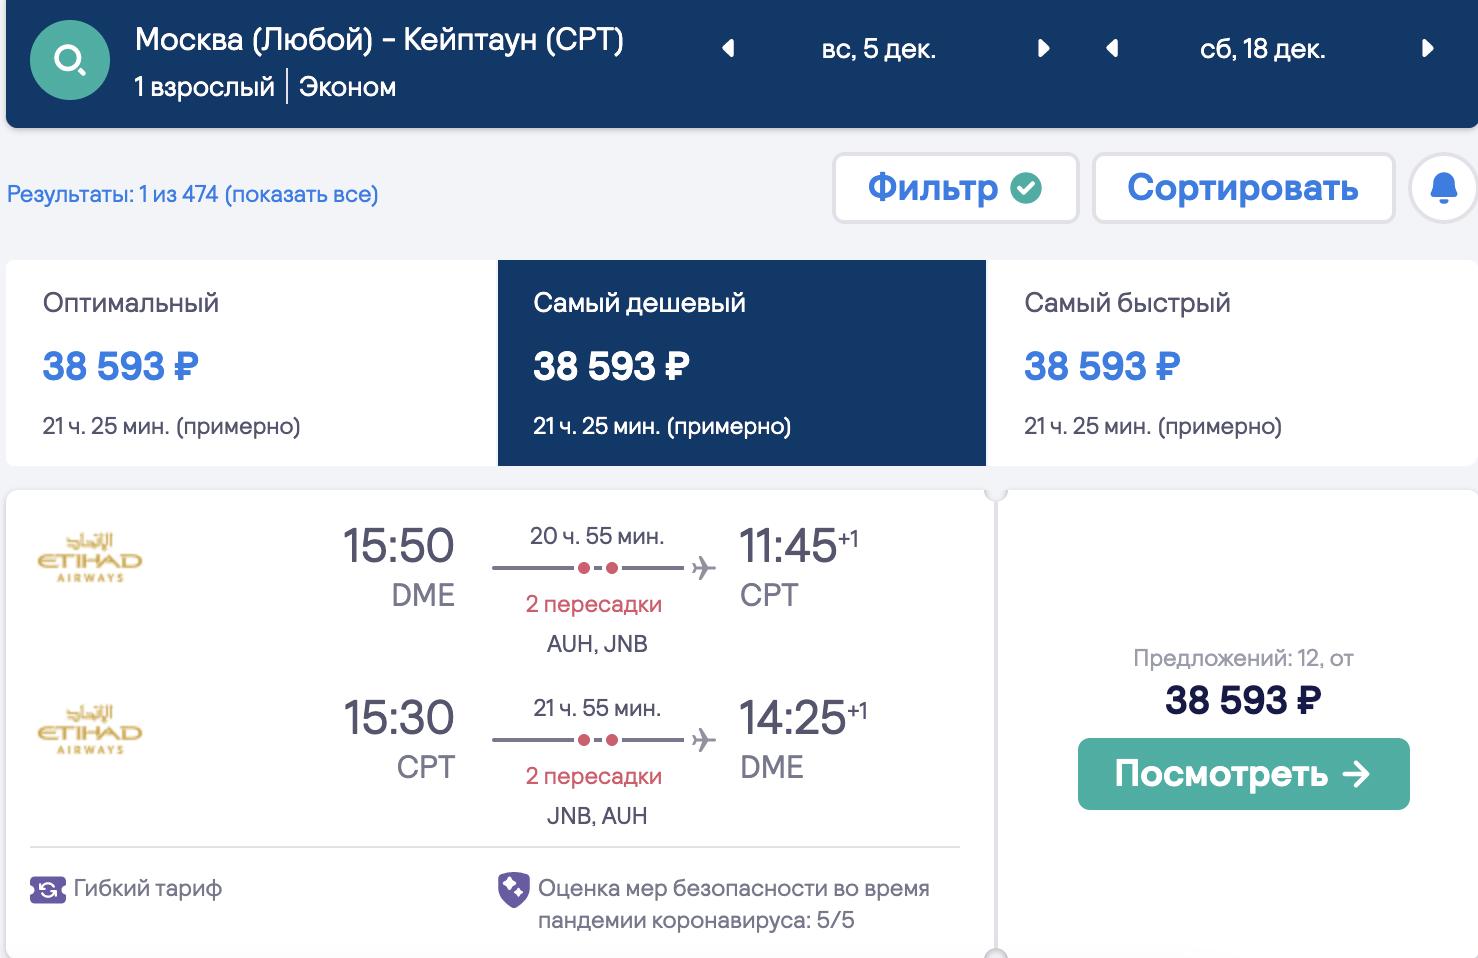 В ЮАР из Москвы: Кейптаун или Йоханнесбург от 38100₽ туда-обратно с Etihad Airways